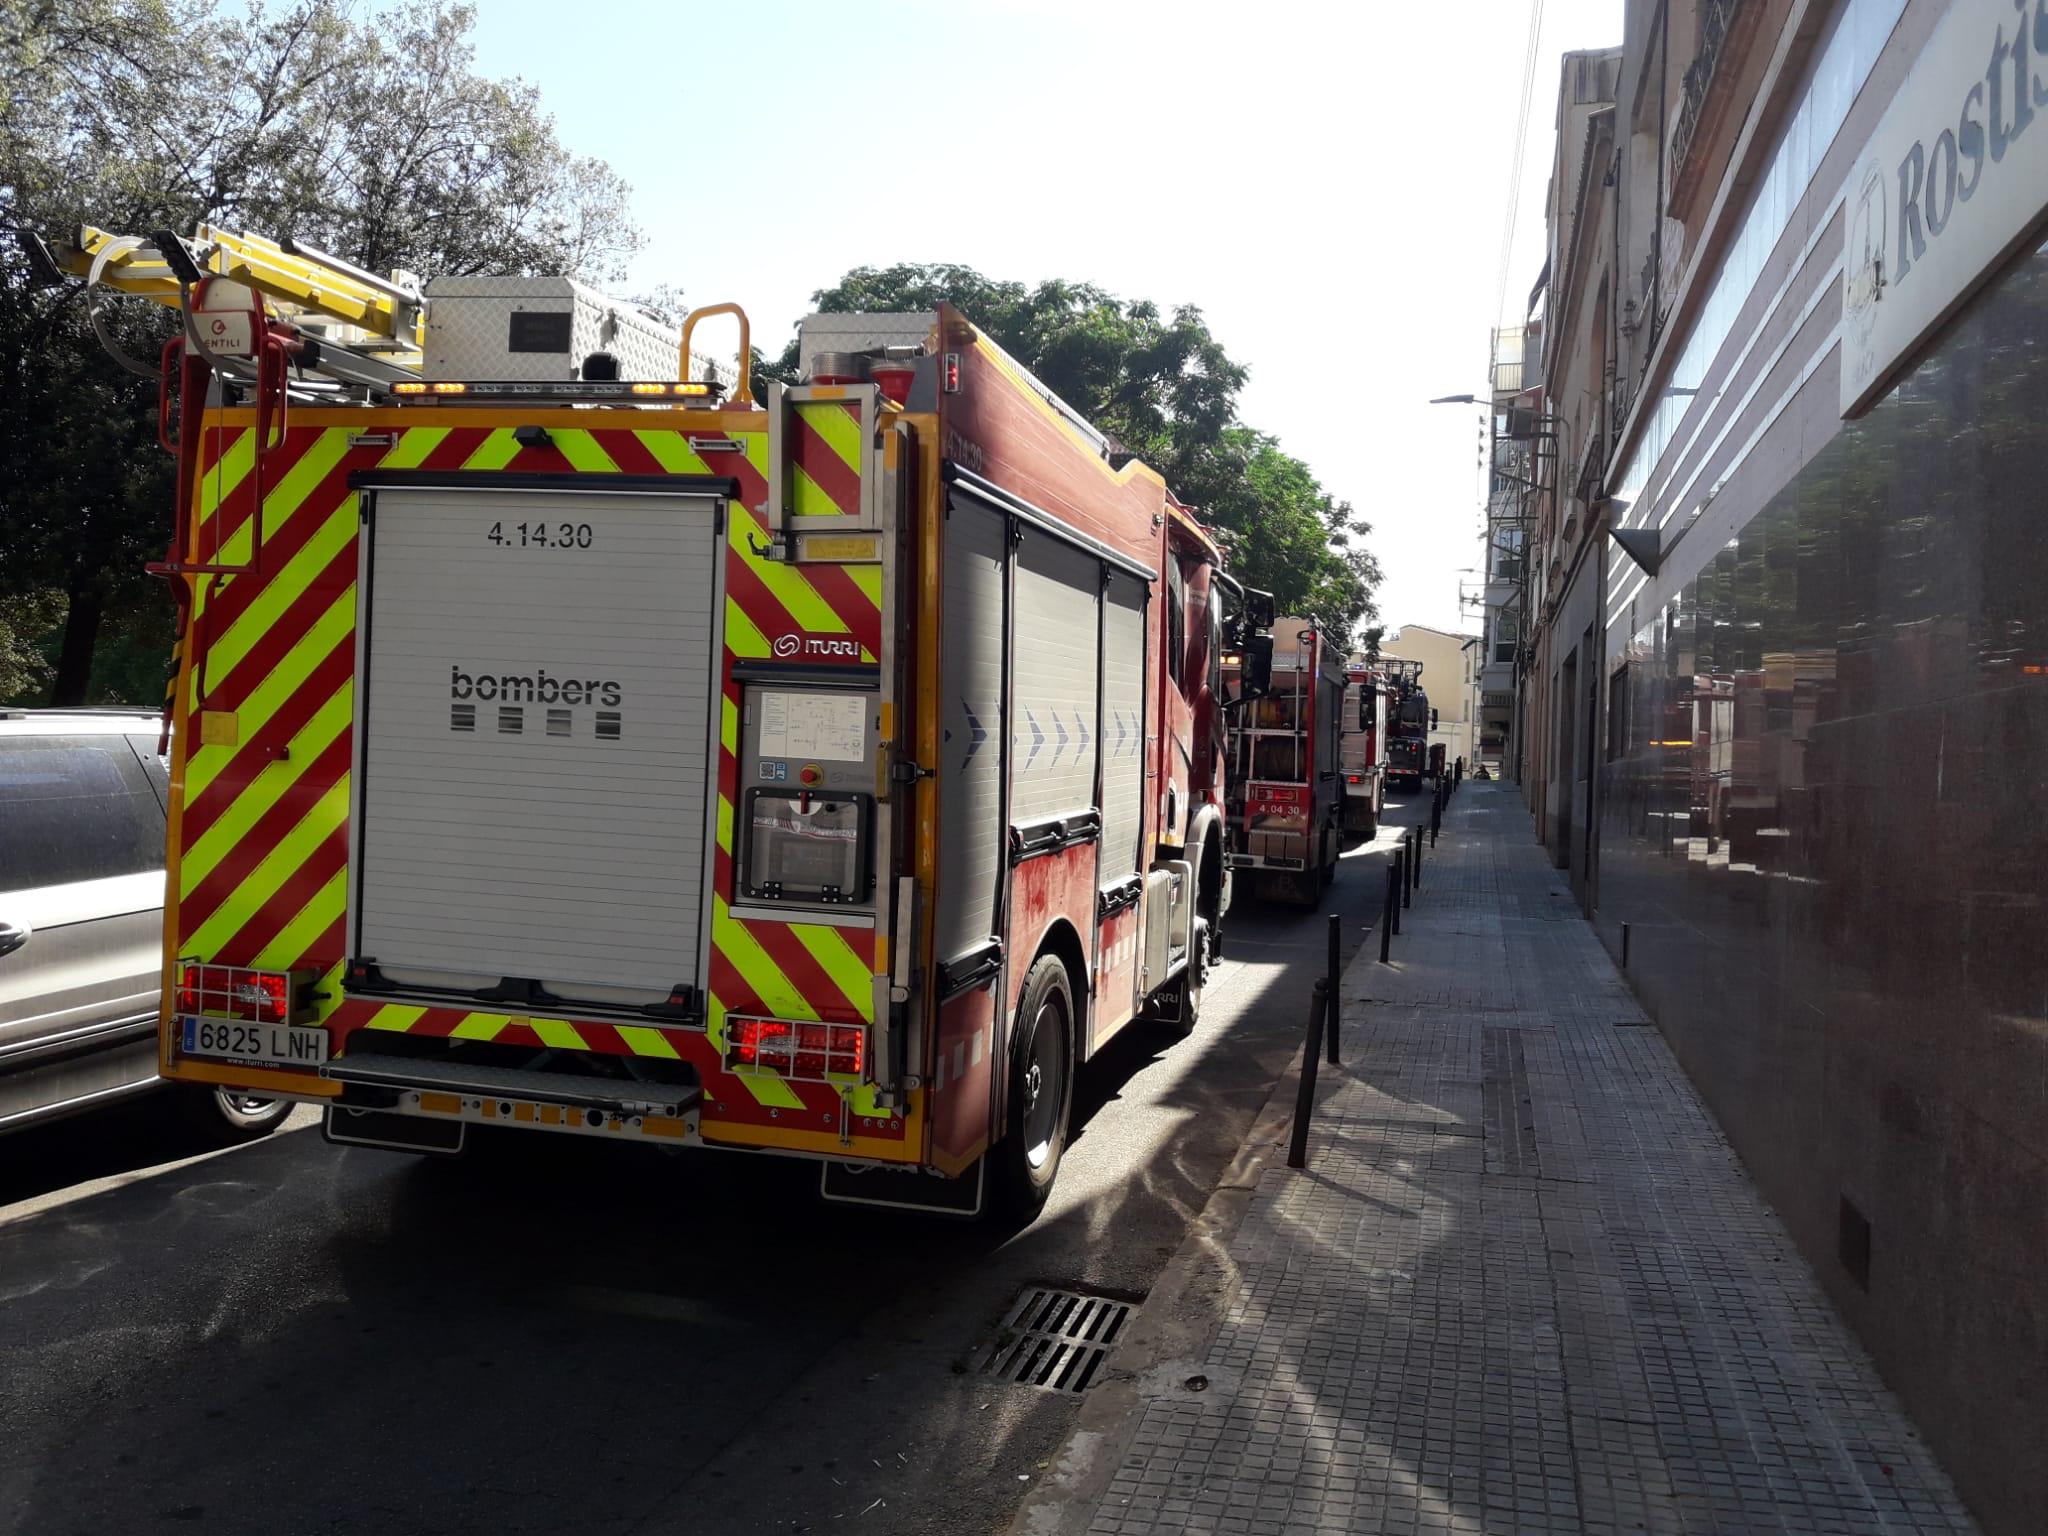 Incendi al carrer d'Antoninus Pius de Terrassa/Joan Manel Oller